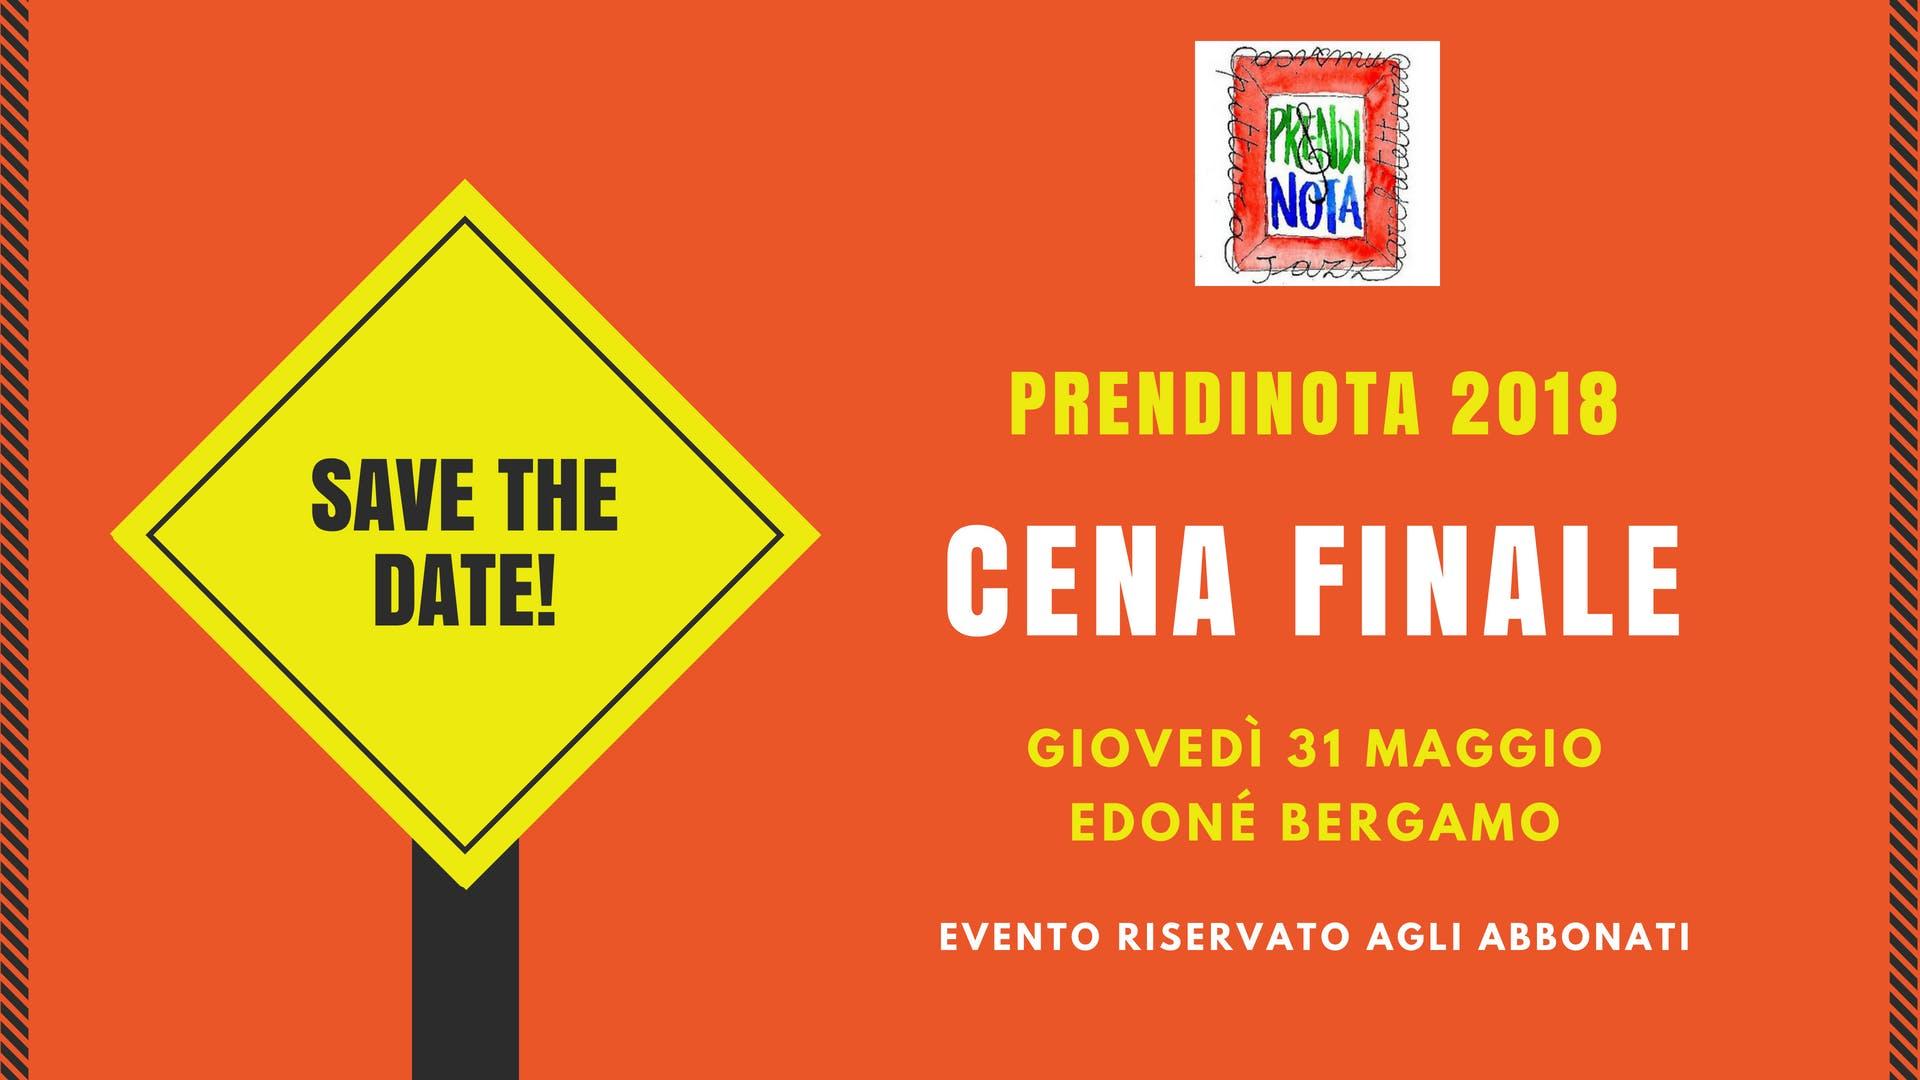 Cena finale - Prendinota 2018